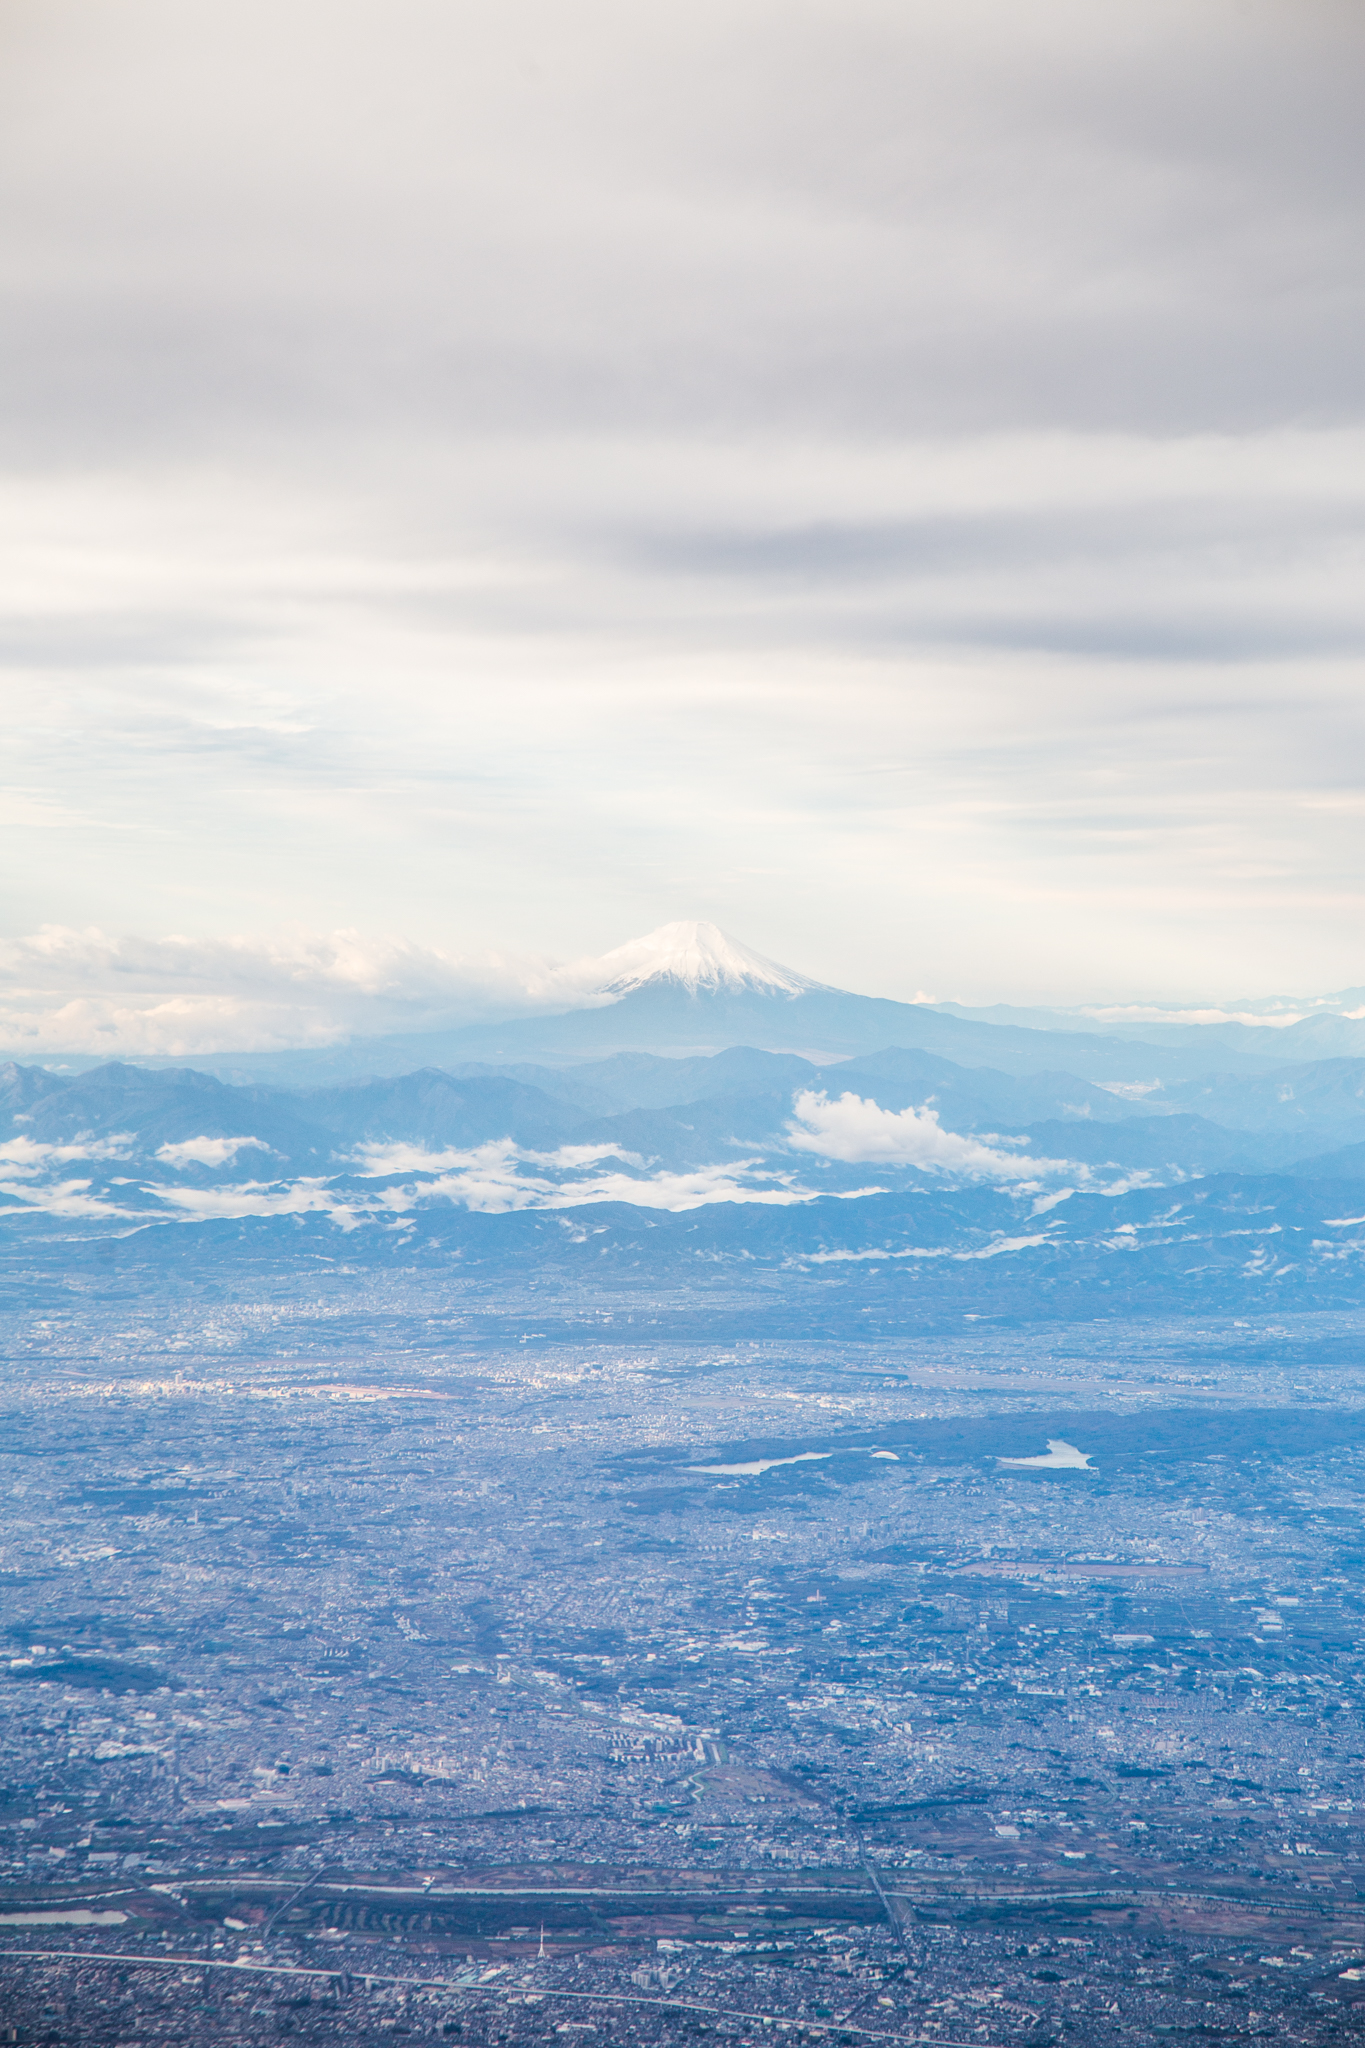 2. Mt Fuji - IMG_7566